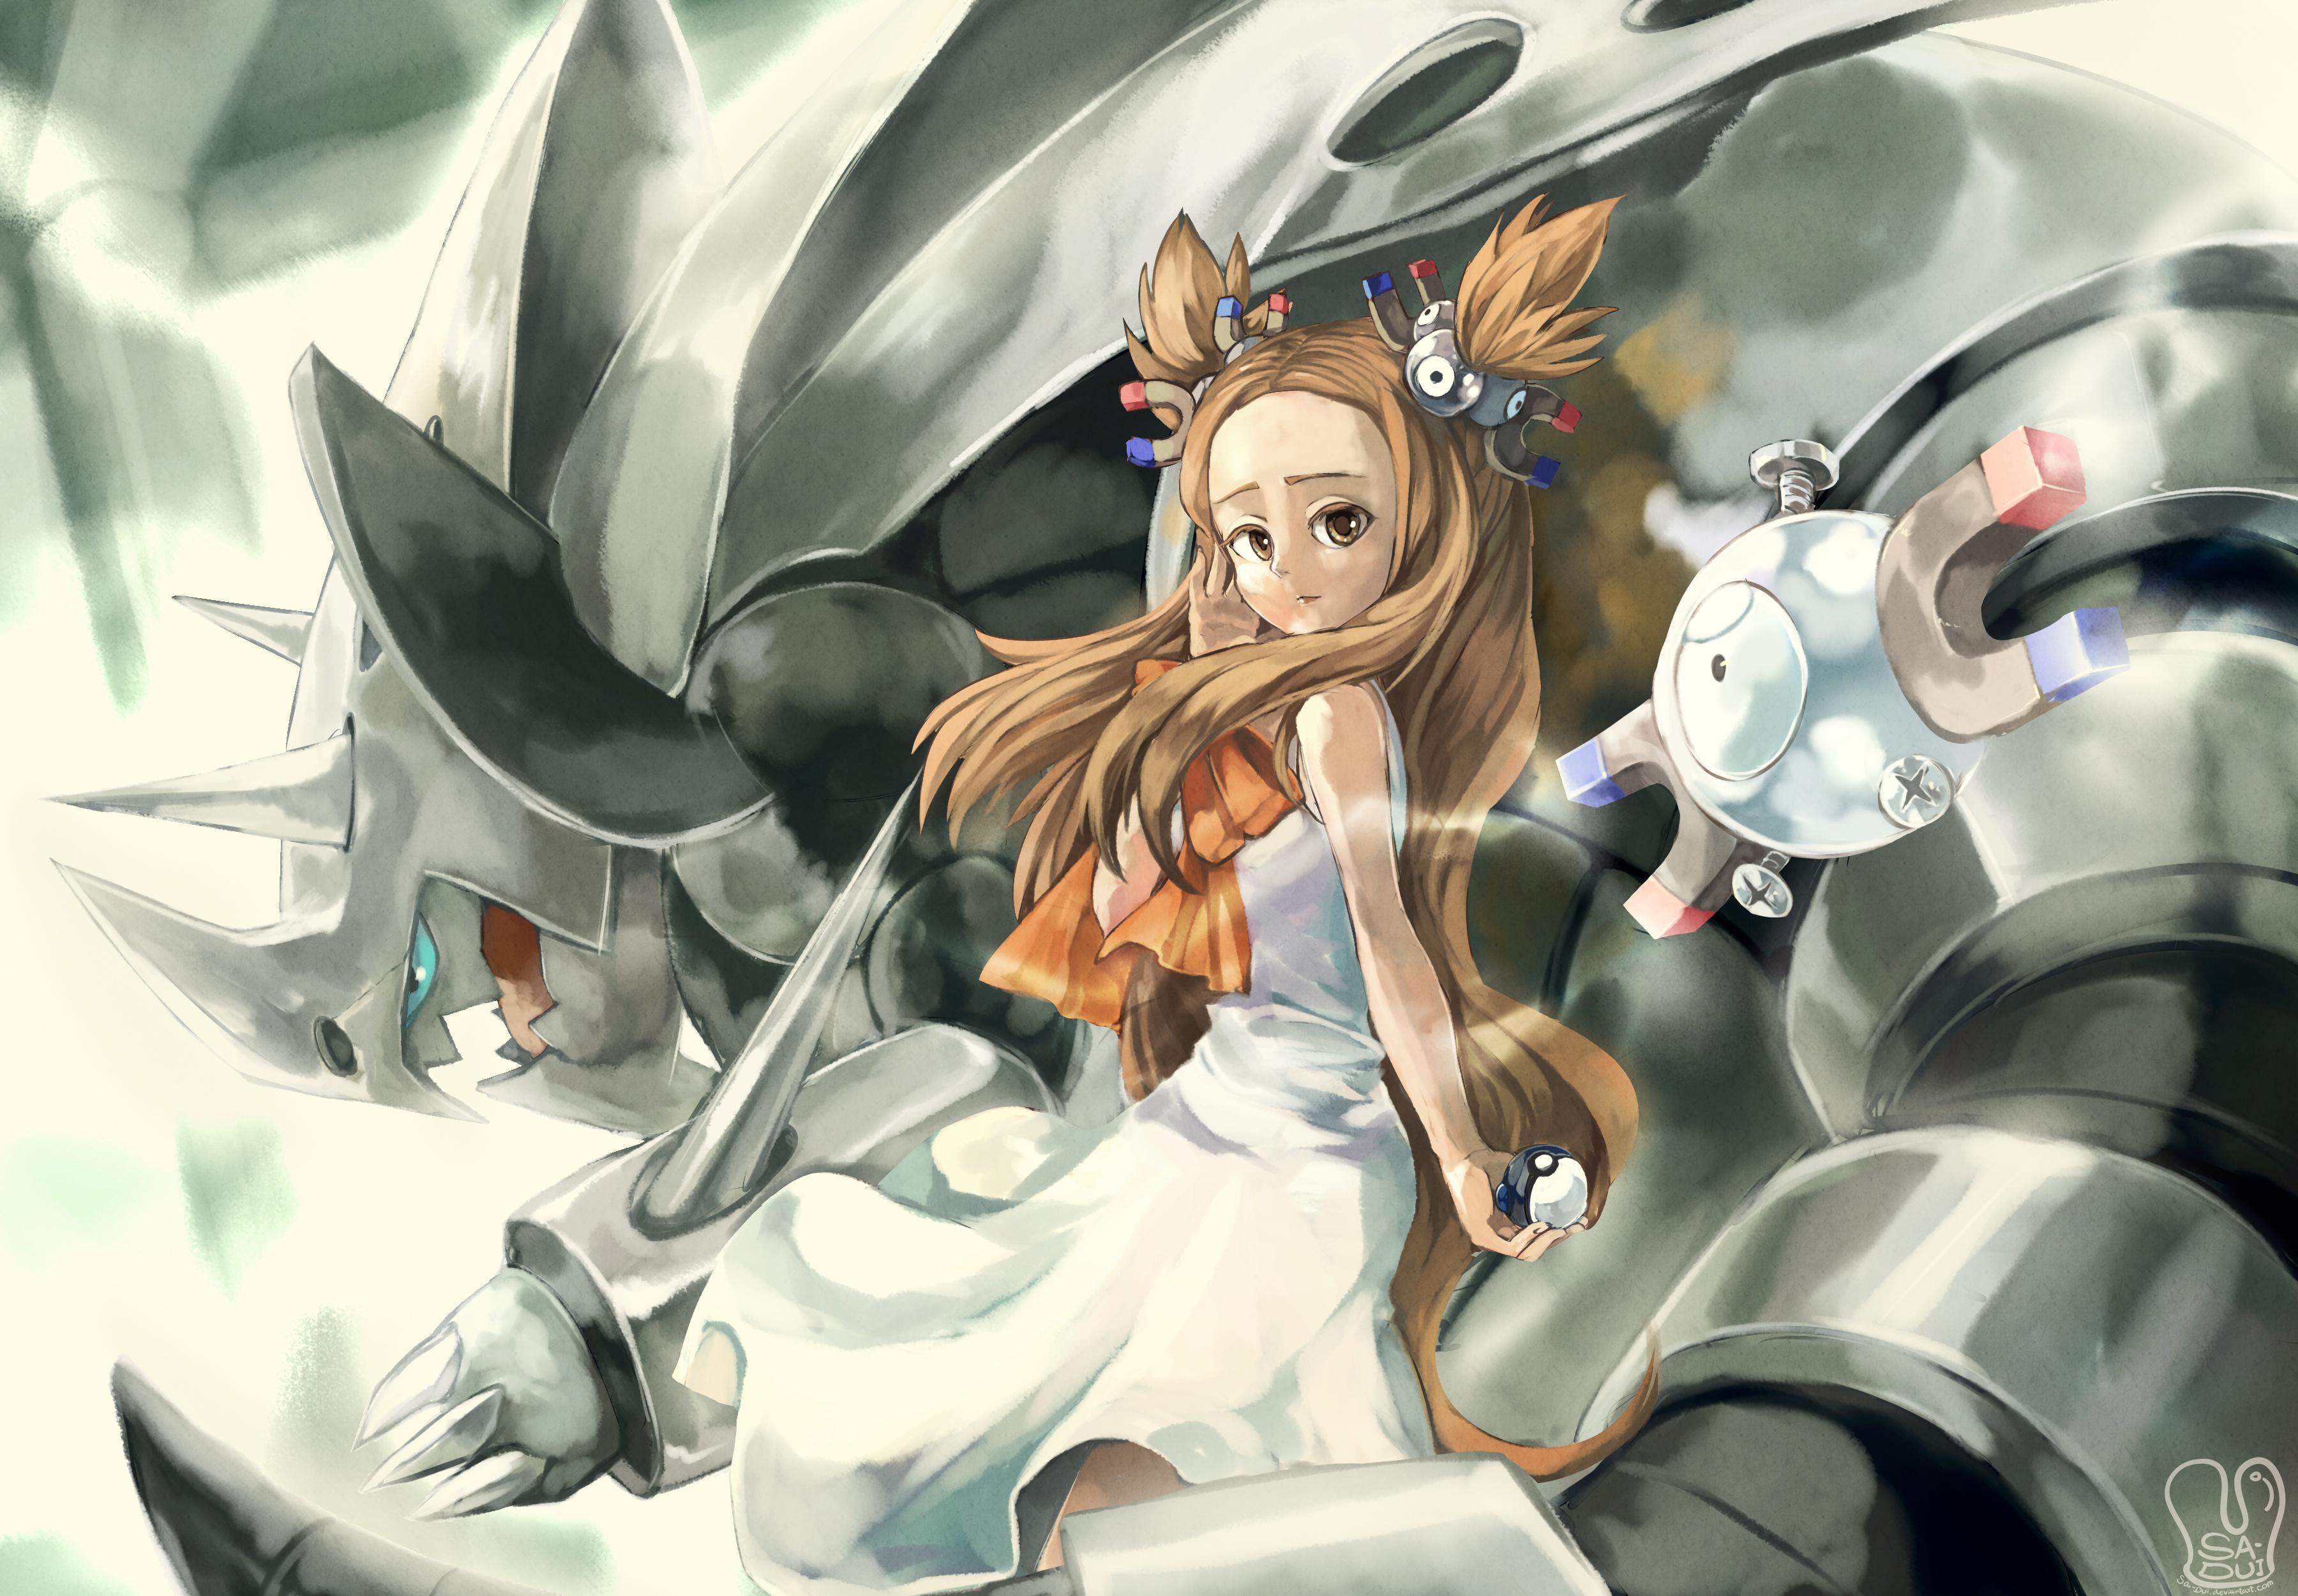 [Art] Jasmine Her Mega Aggron pokemon 3600x2500